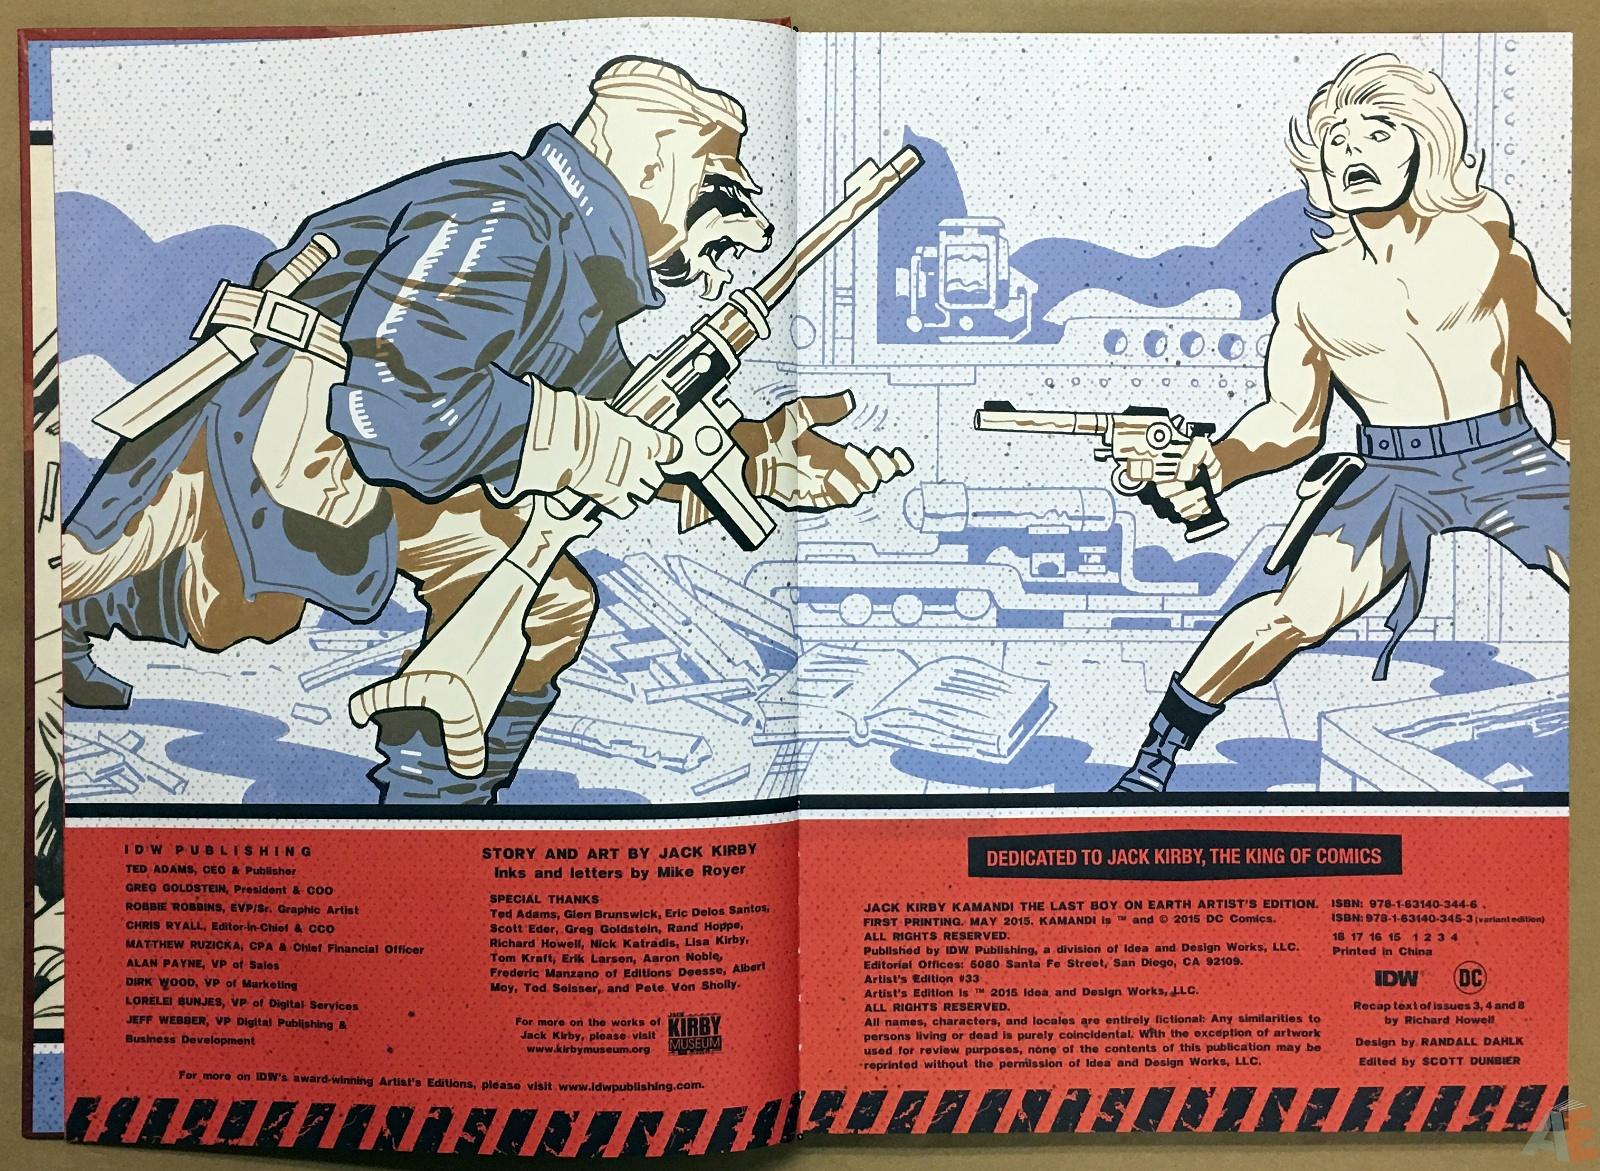 Jack Kirby Kamandi The Last Boy On Earth Artist's Edition 4